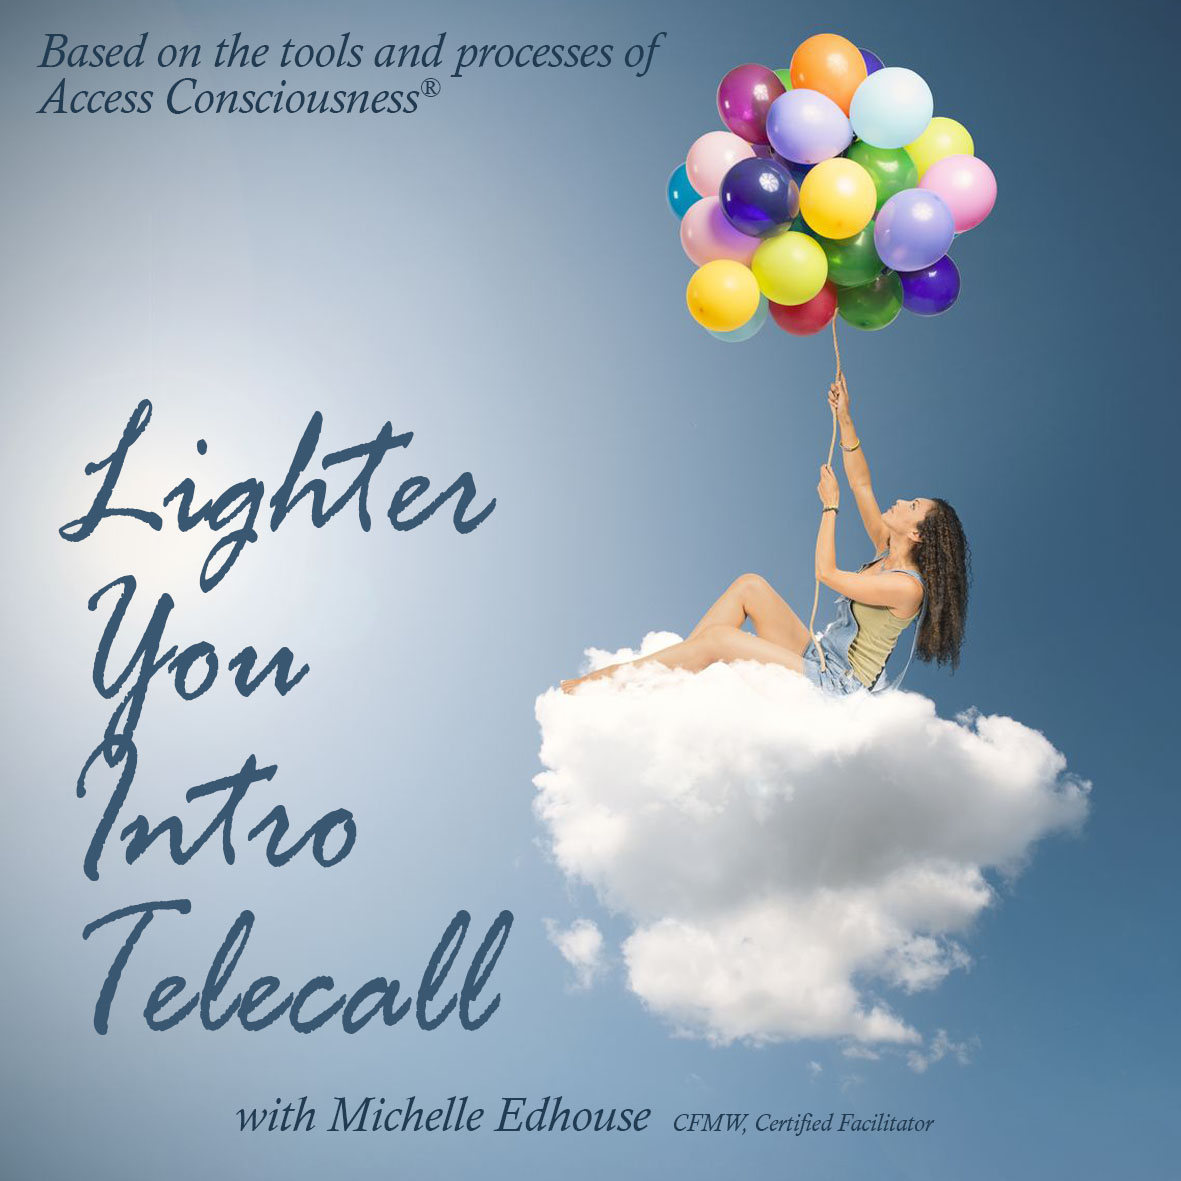 Lighter You Intro Telecall